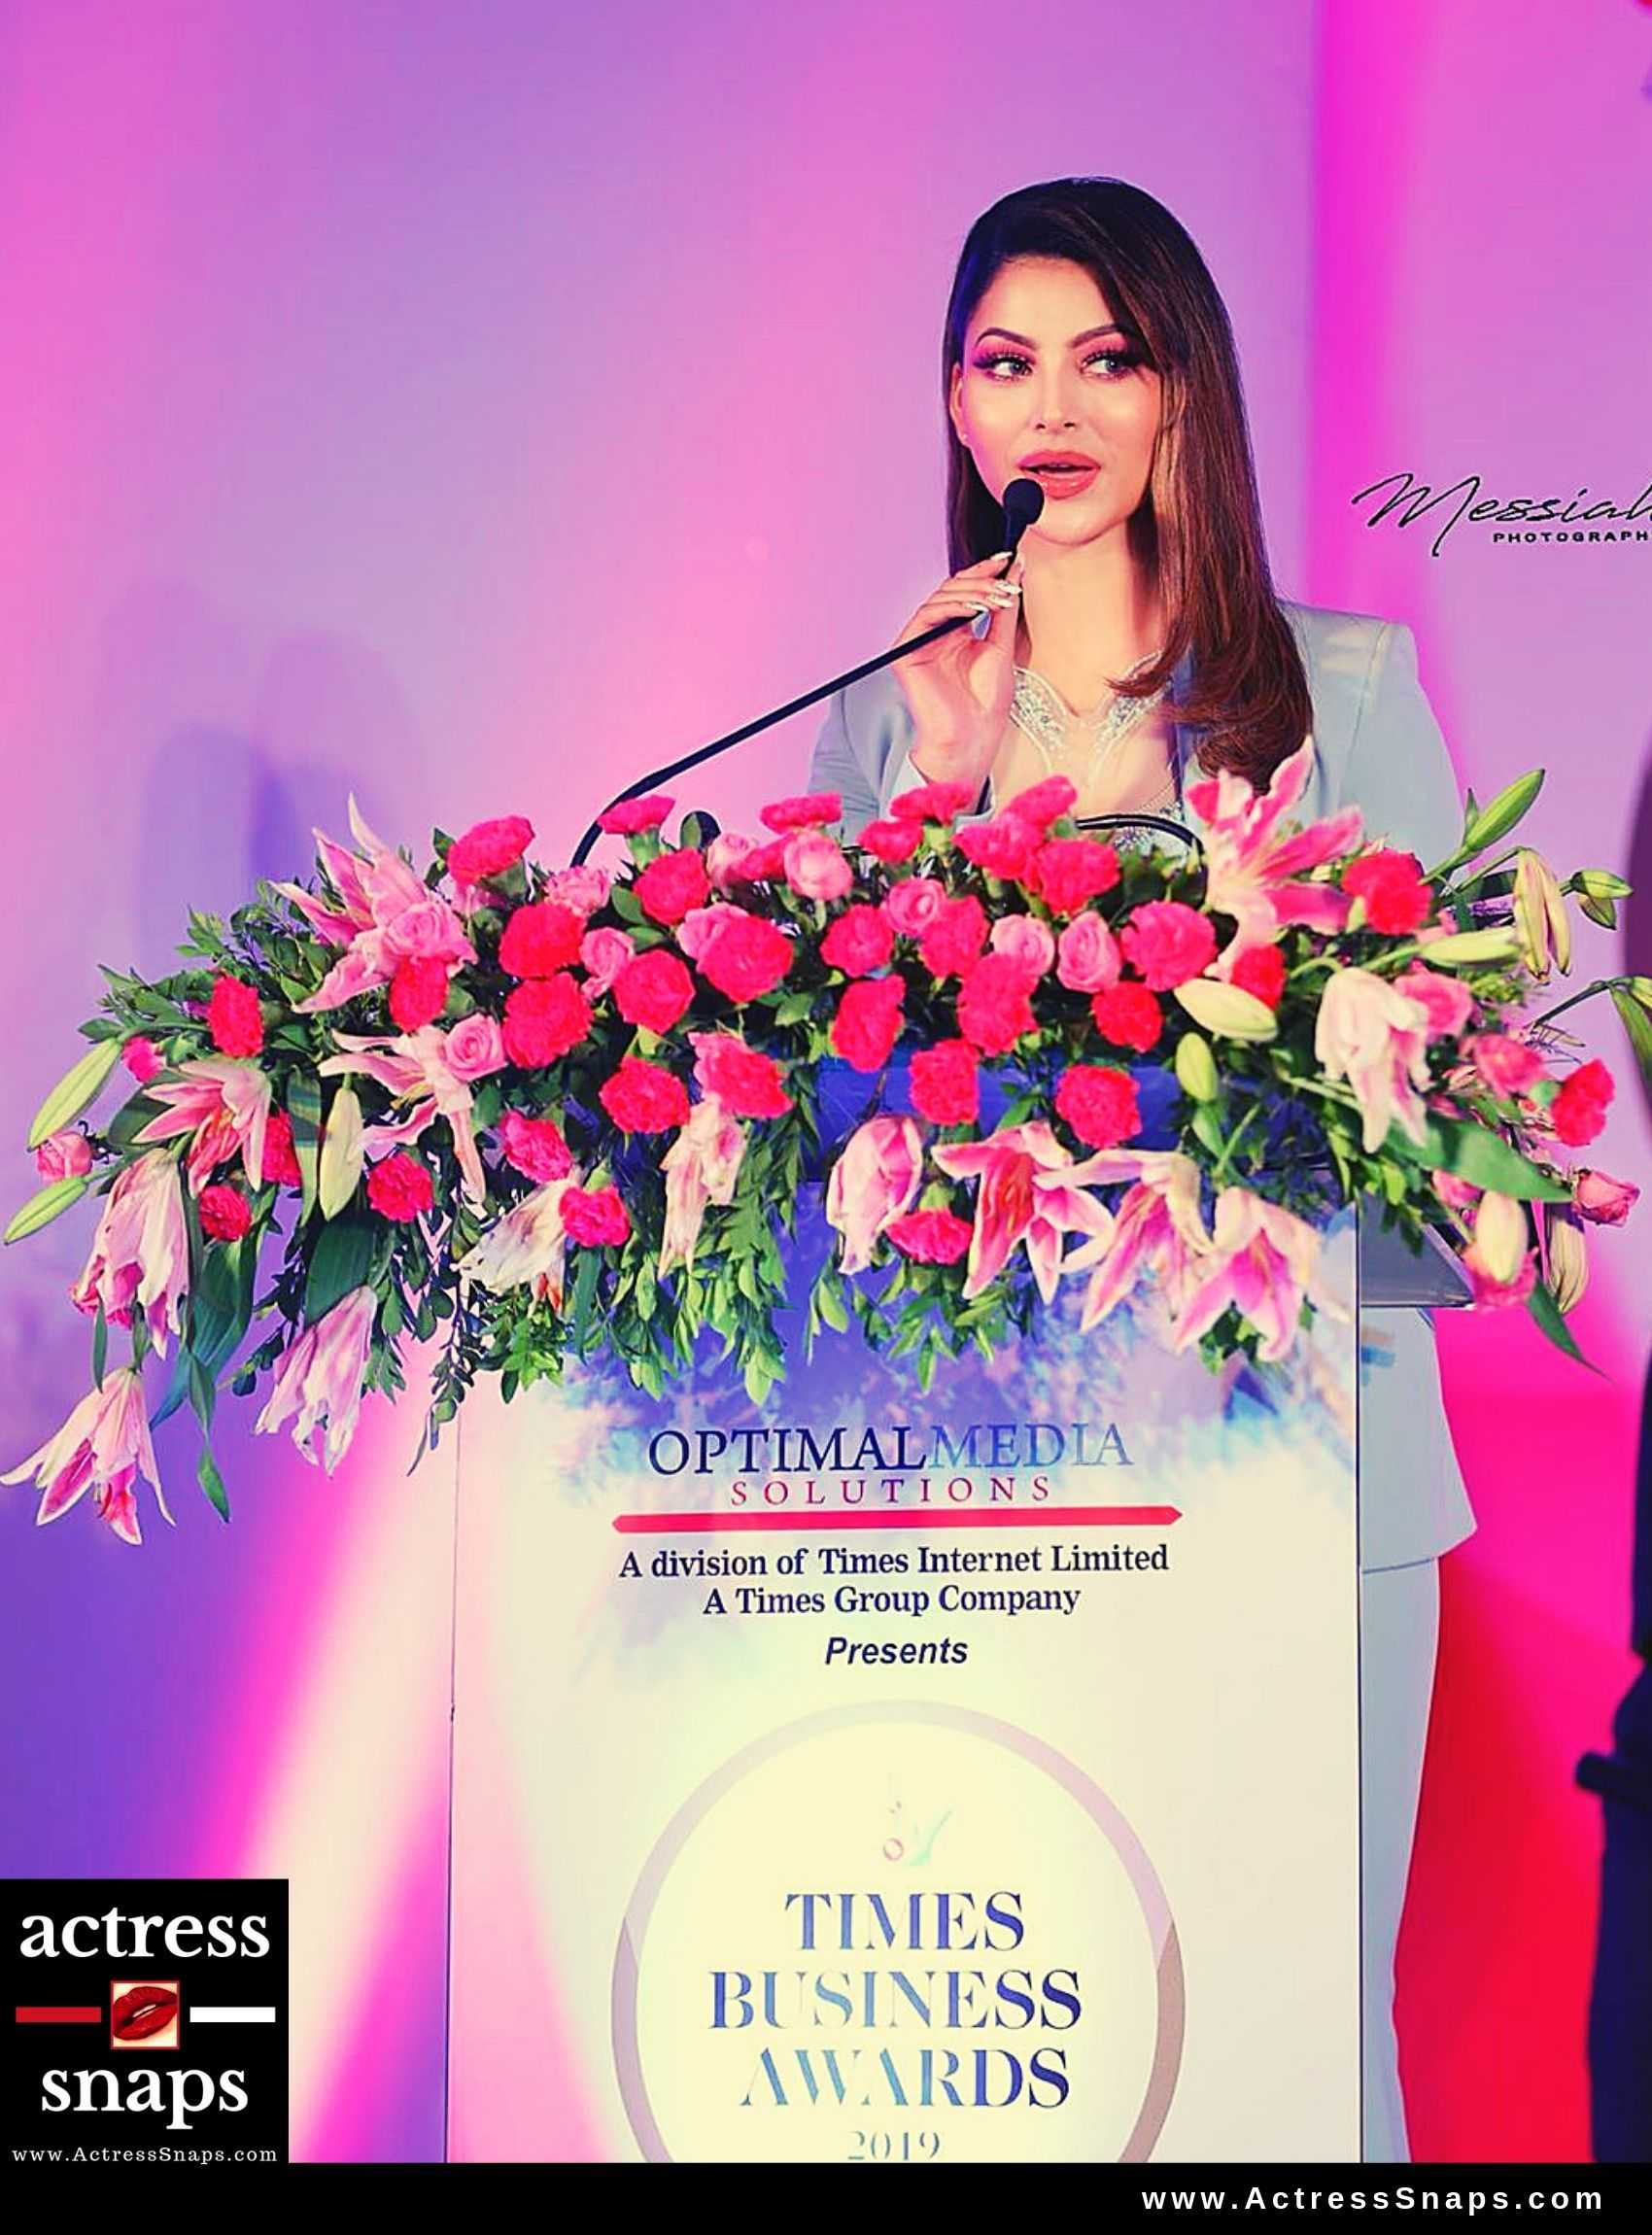 Urvashi Rautela - Times Business Awards - Sexy Actress Pictures | Hot Actress Pictures - ActressSnaps.com